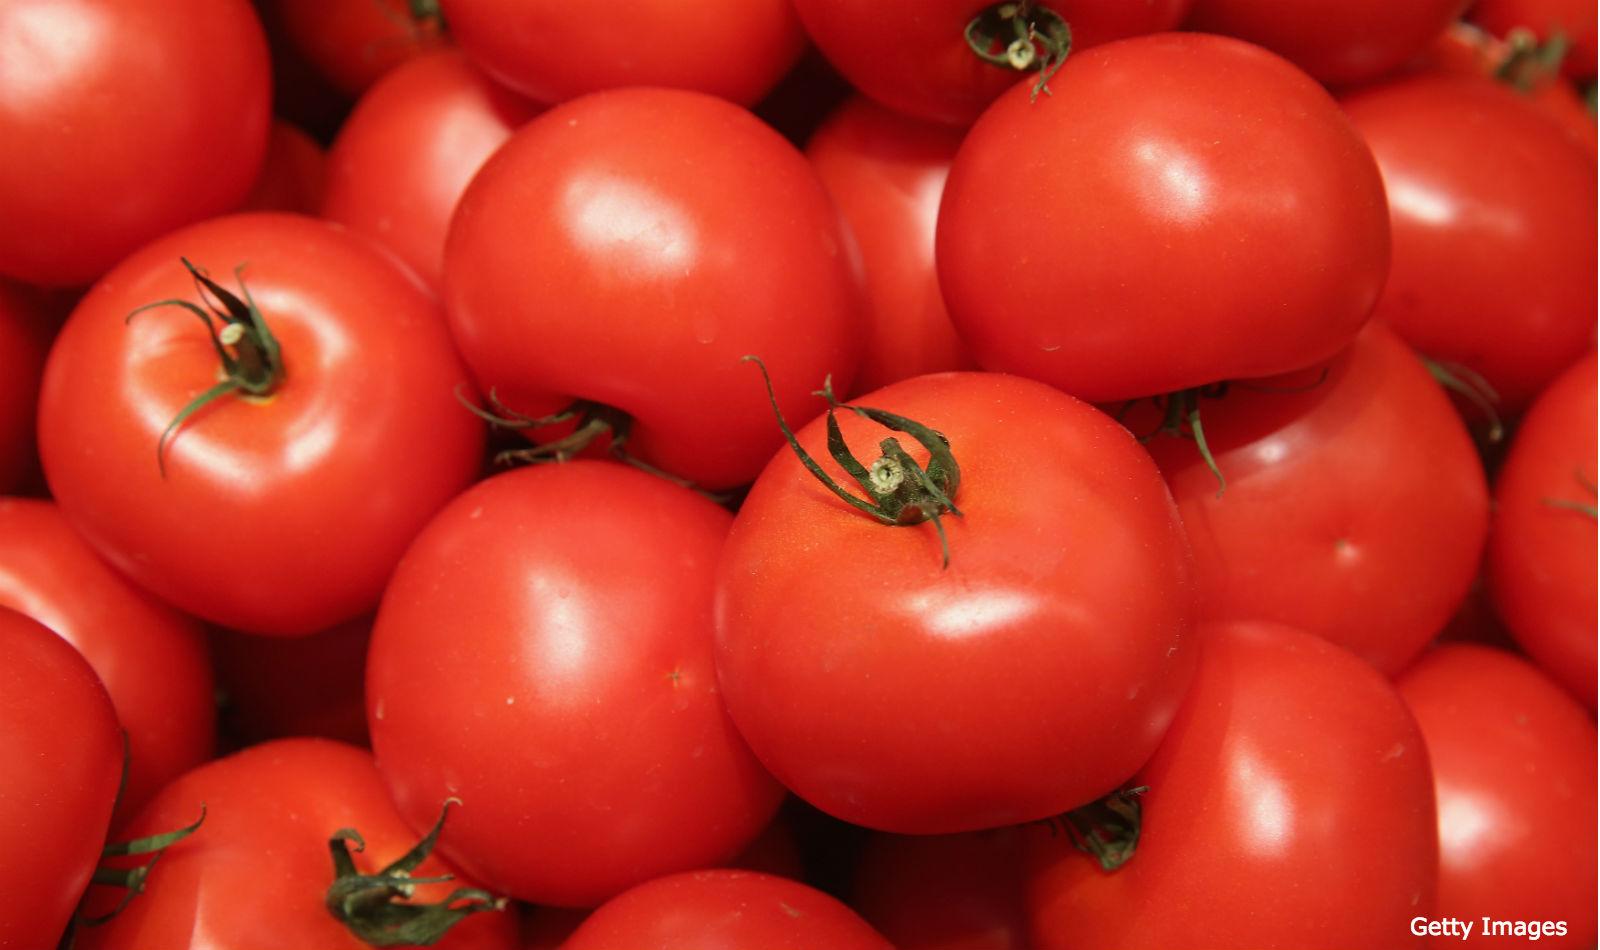 tomates les exportations vers l 39 ue sont rest es stables